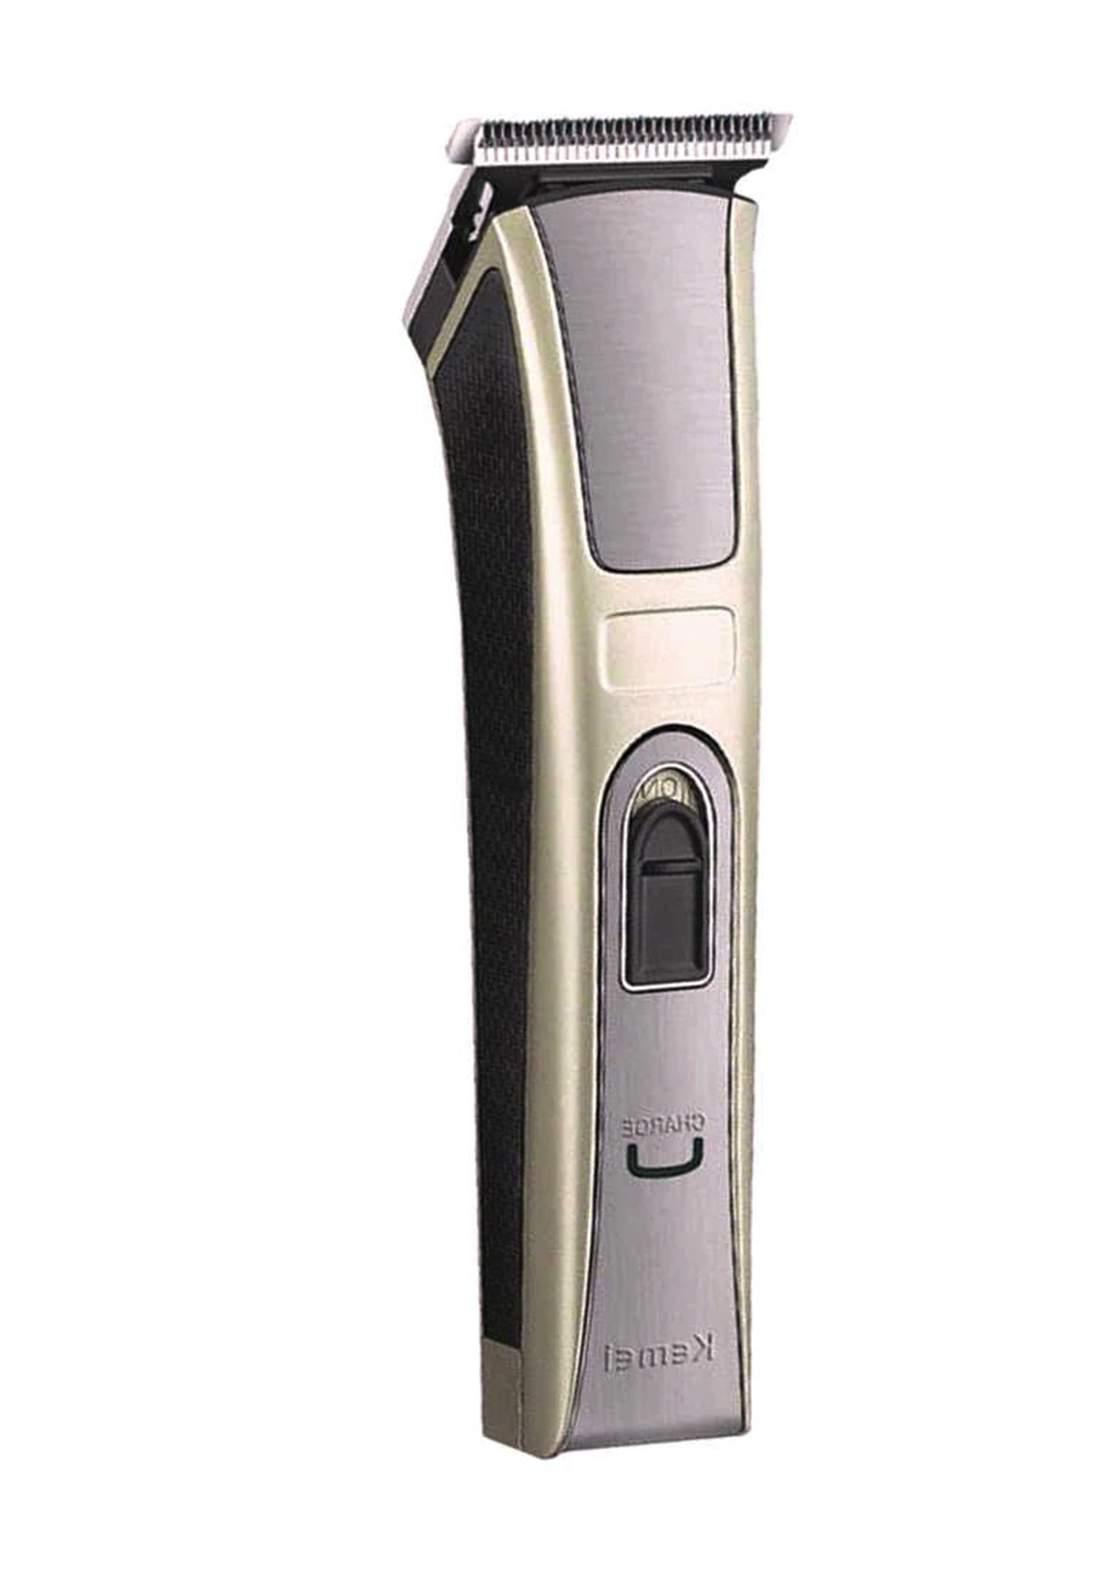 Kemei KM-5017 Hair Trimmer Rechargeable Electric ماكنة حلاقة رجالية